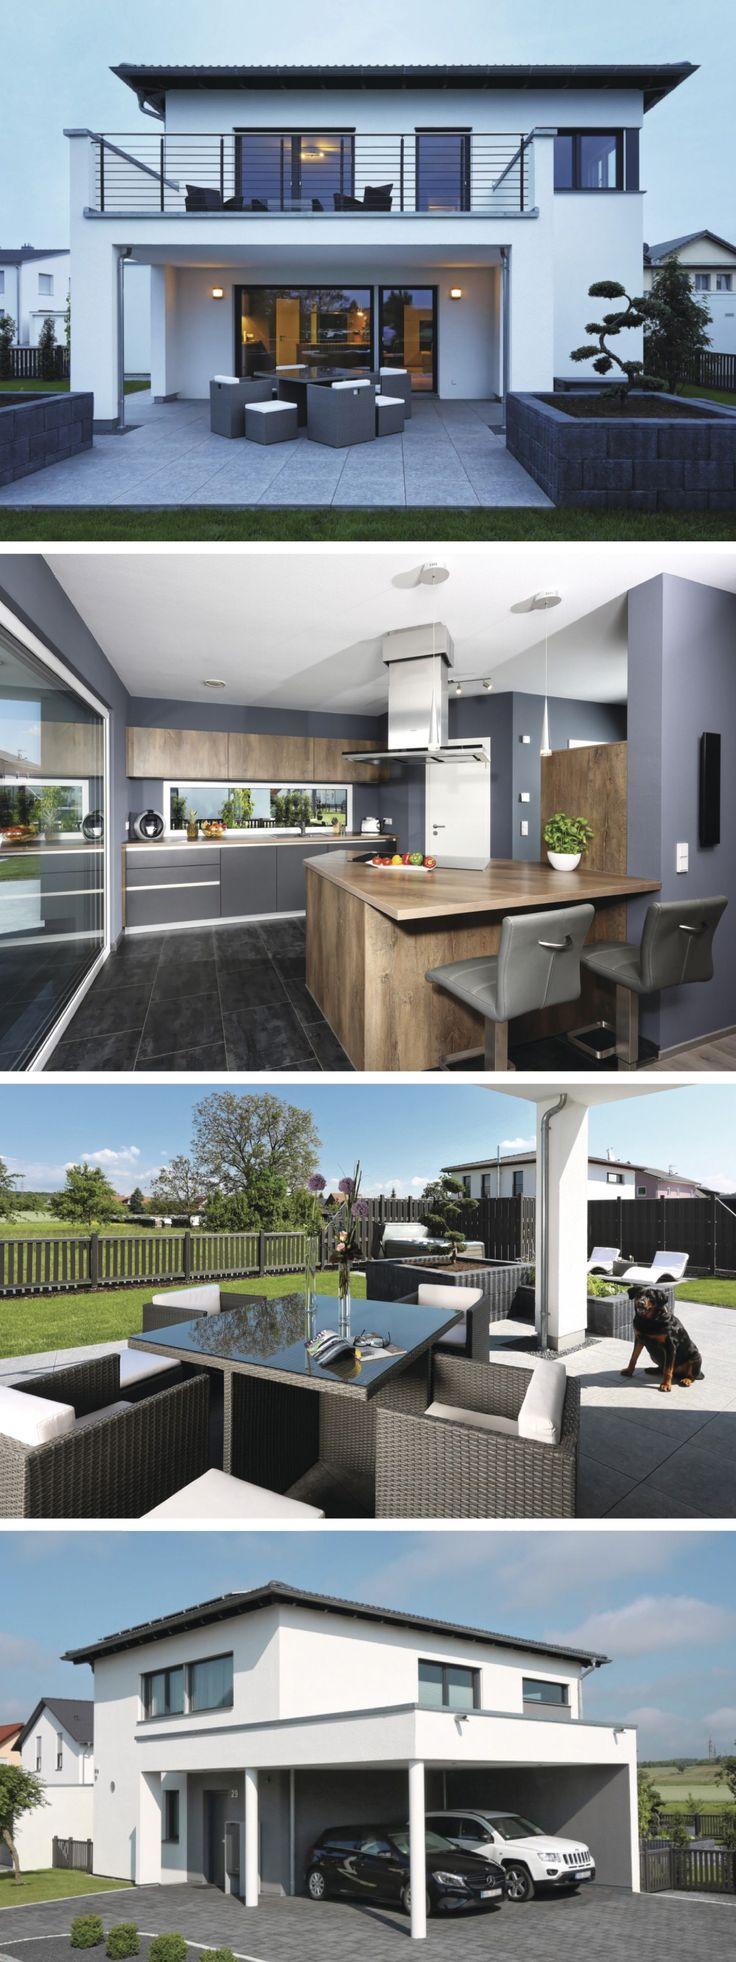 Küchen-designmöbel  best dream house images on pinterest  arquitetura dreams and